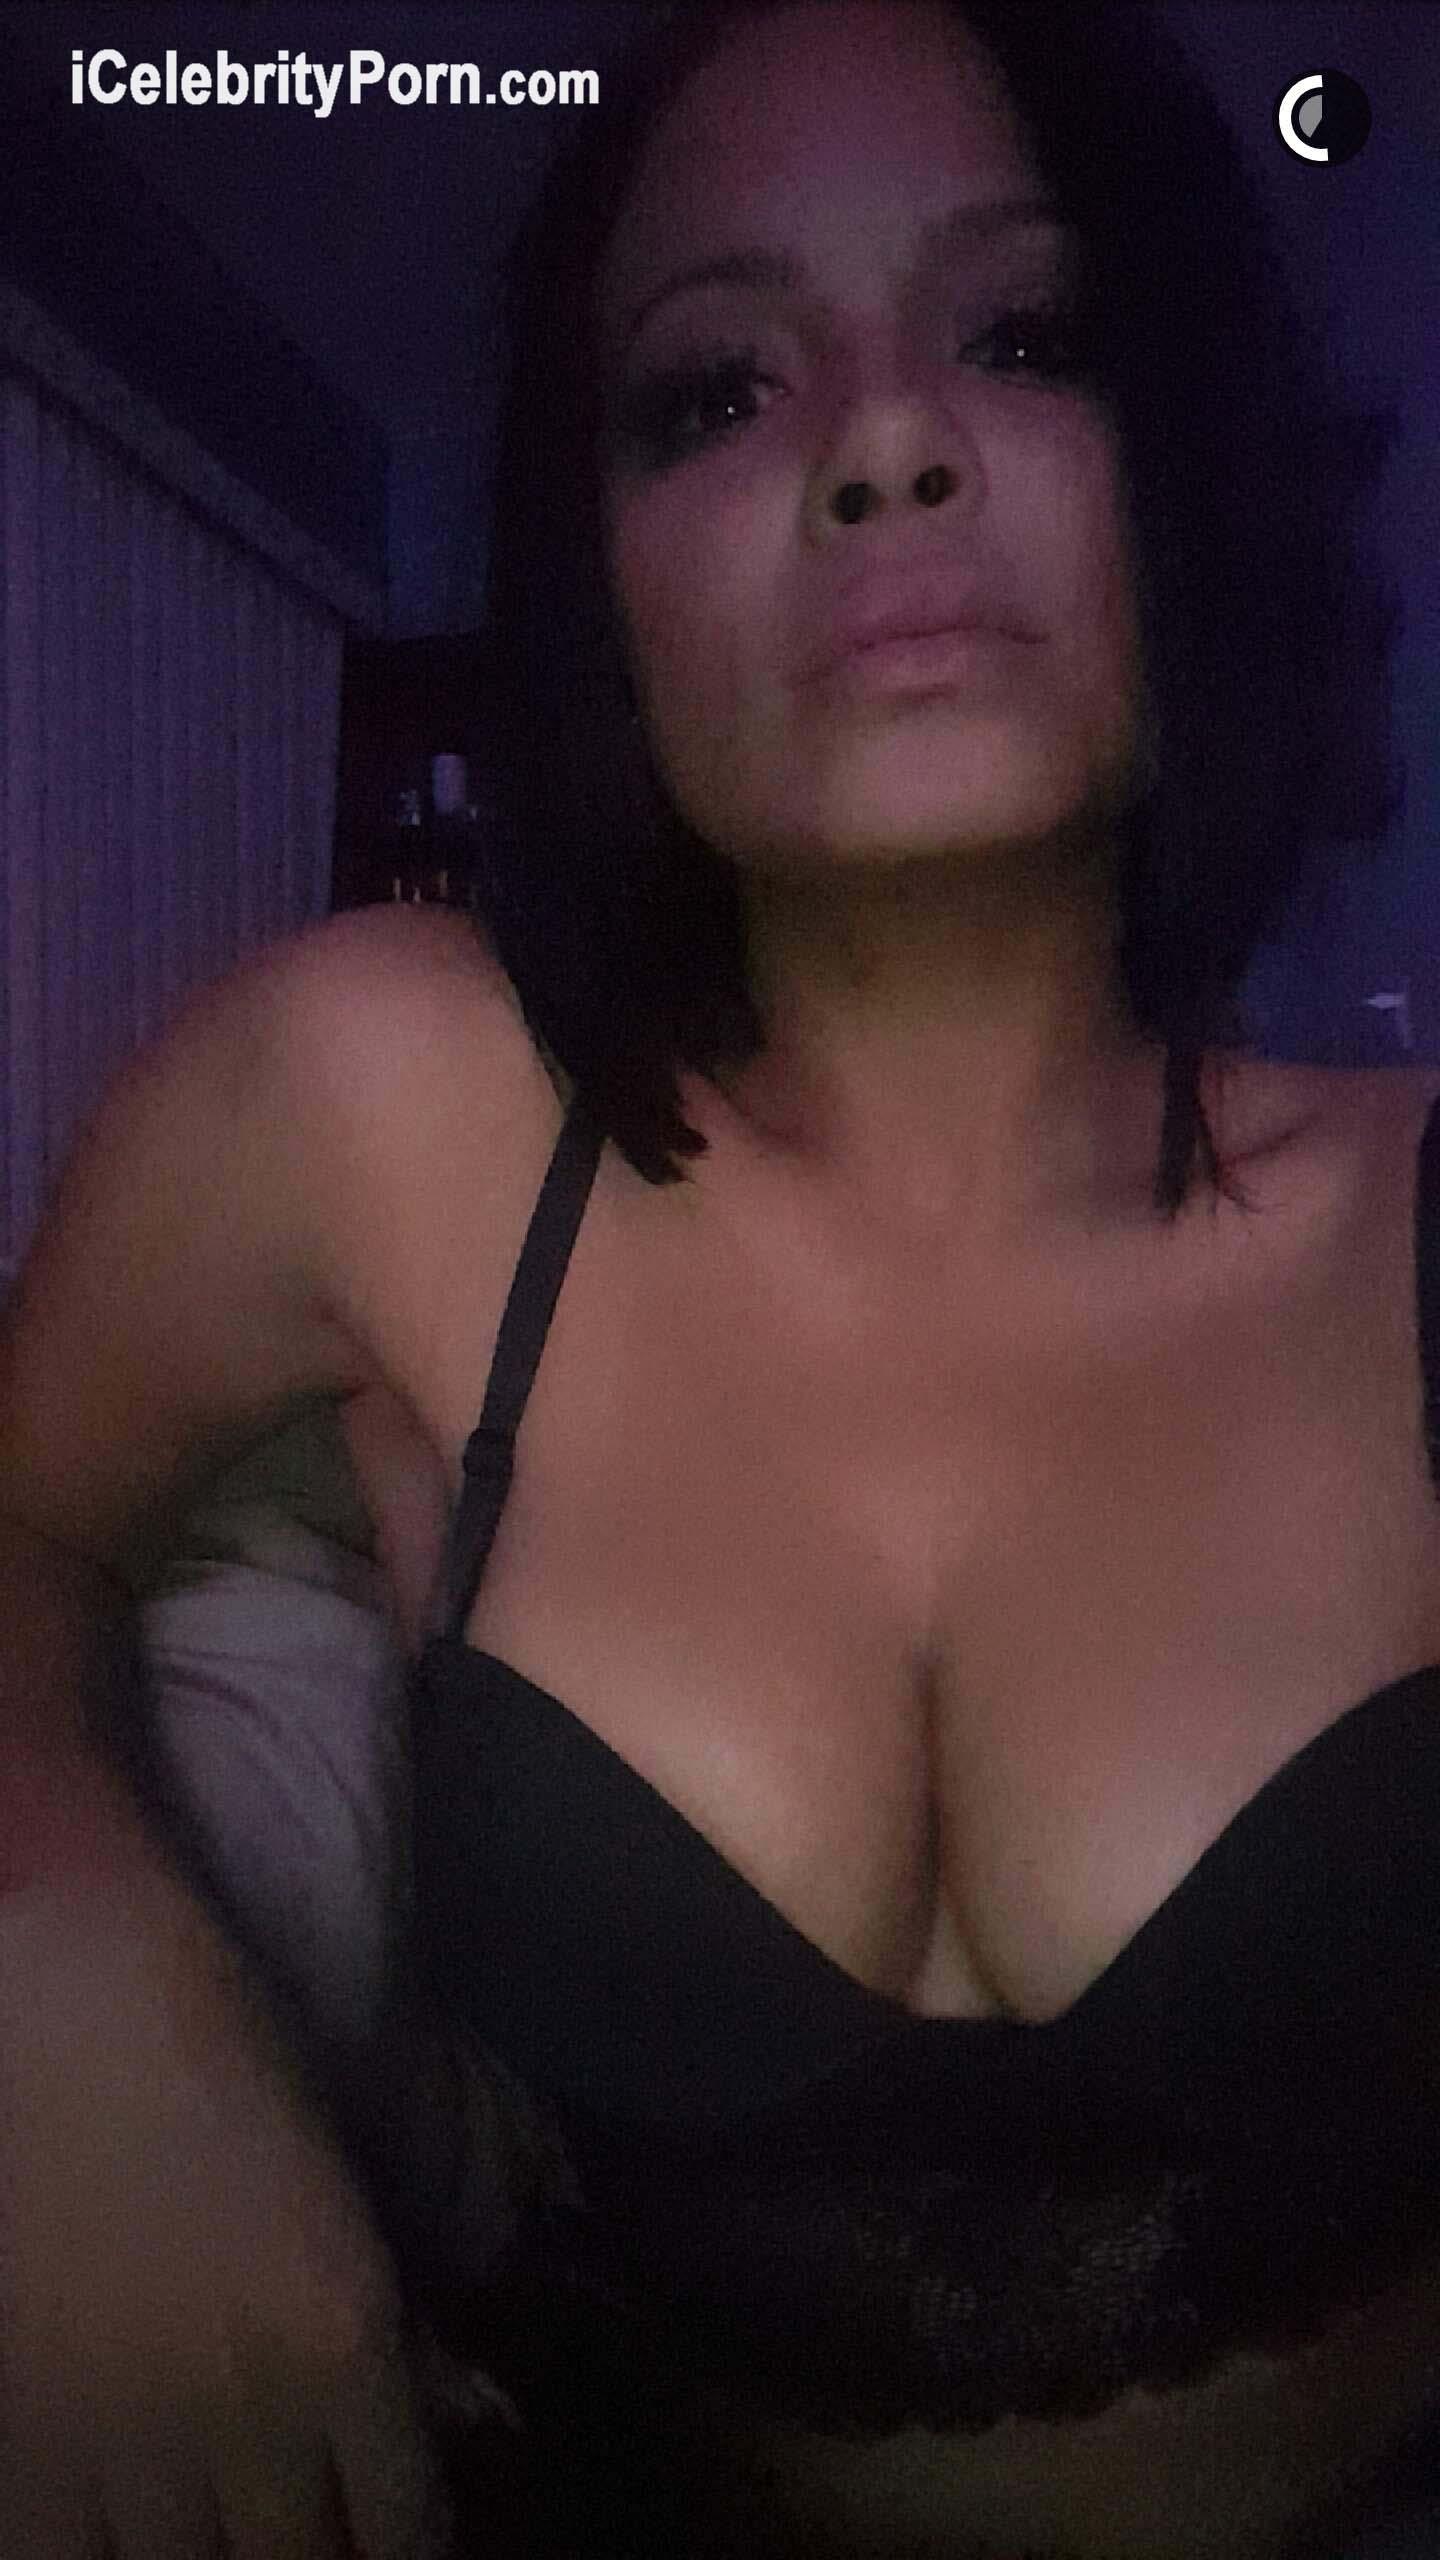 Christina Milian Desnuda Video Snapchat xxx -disney-chanel-porno-fotos-filtradas-actriz-tetas-vagina-almeja (25)